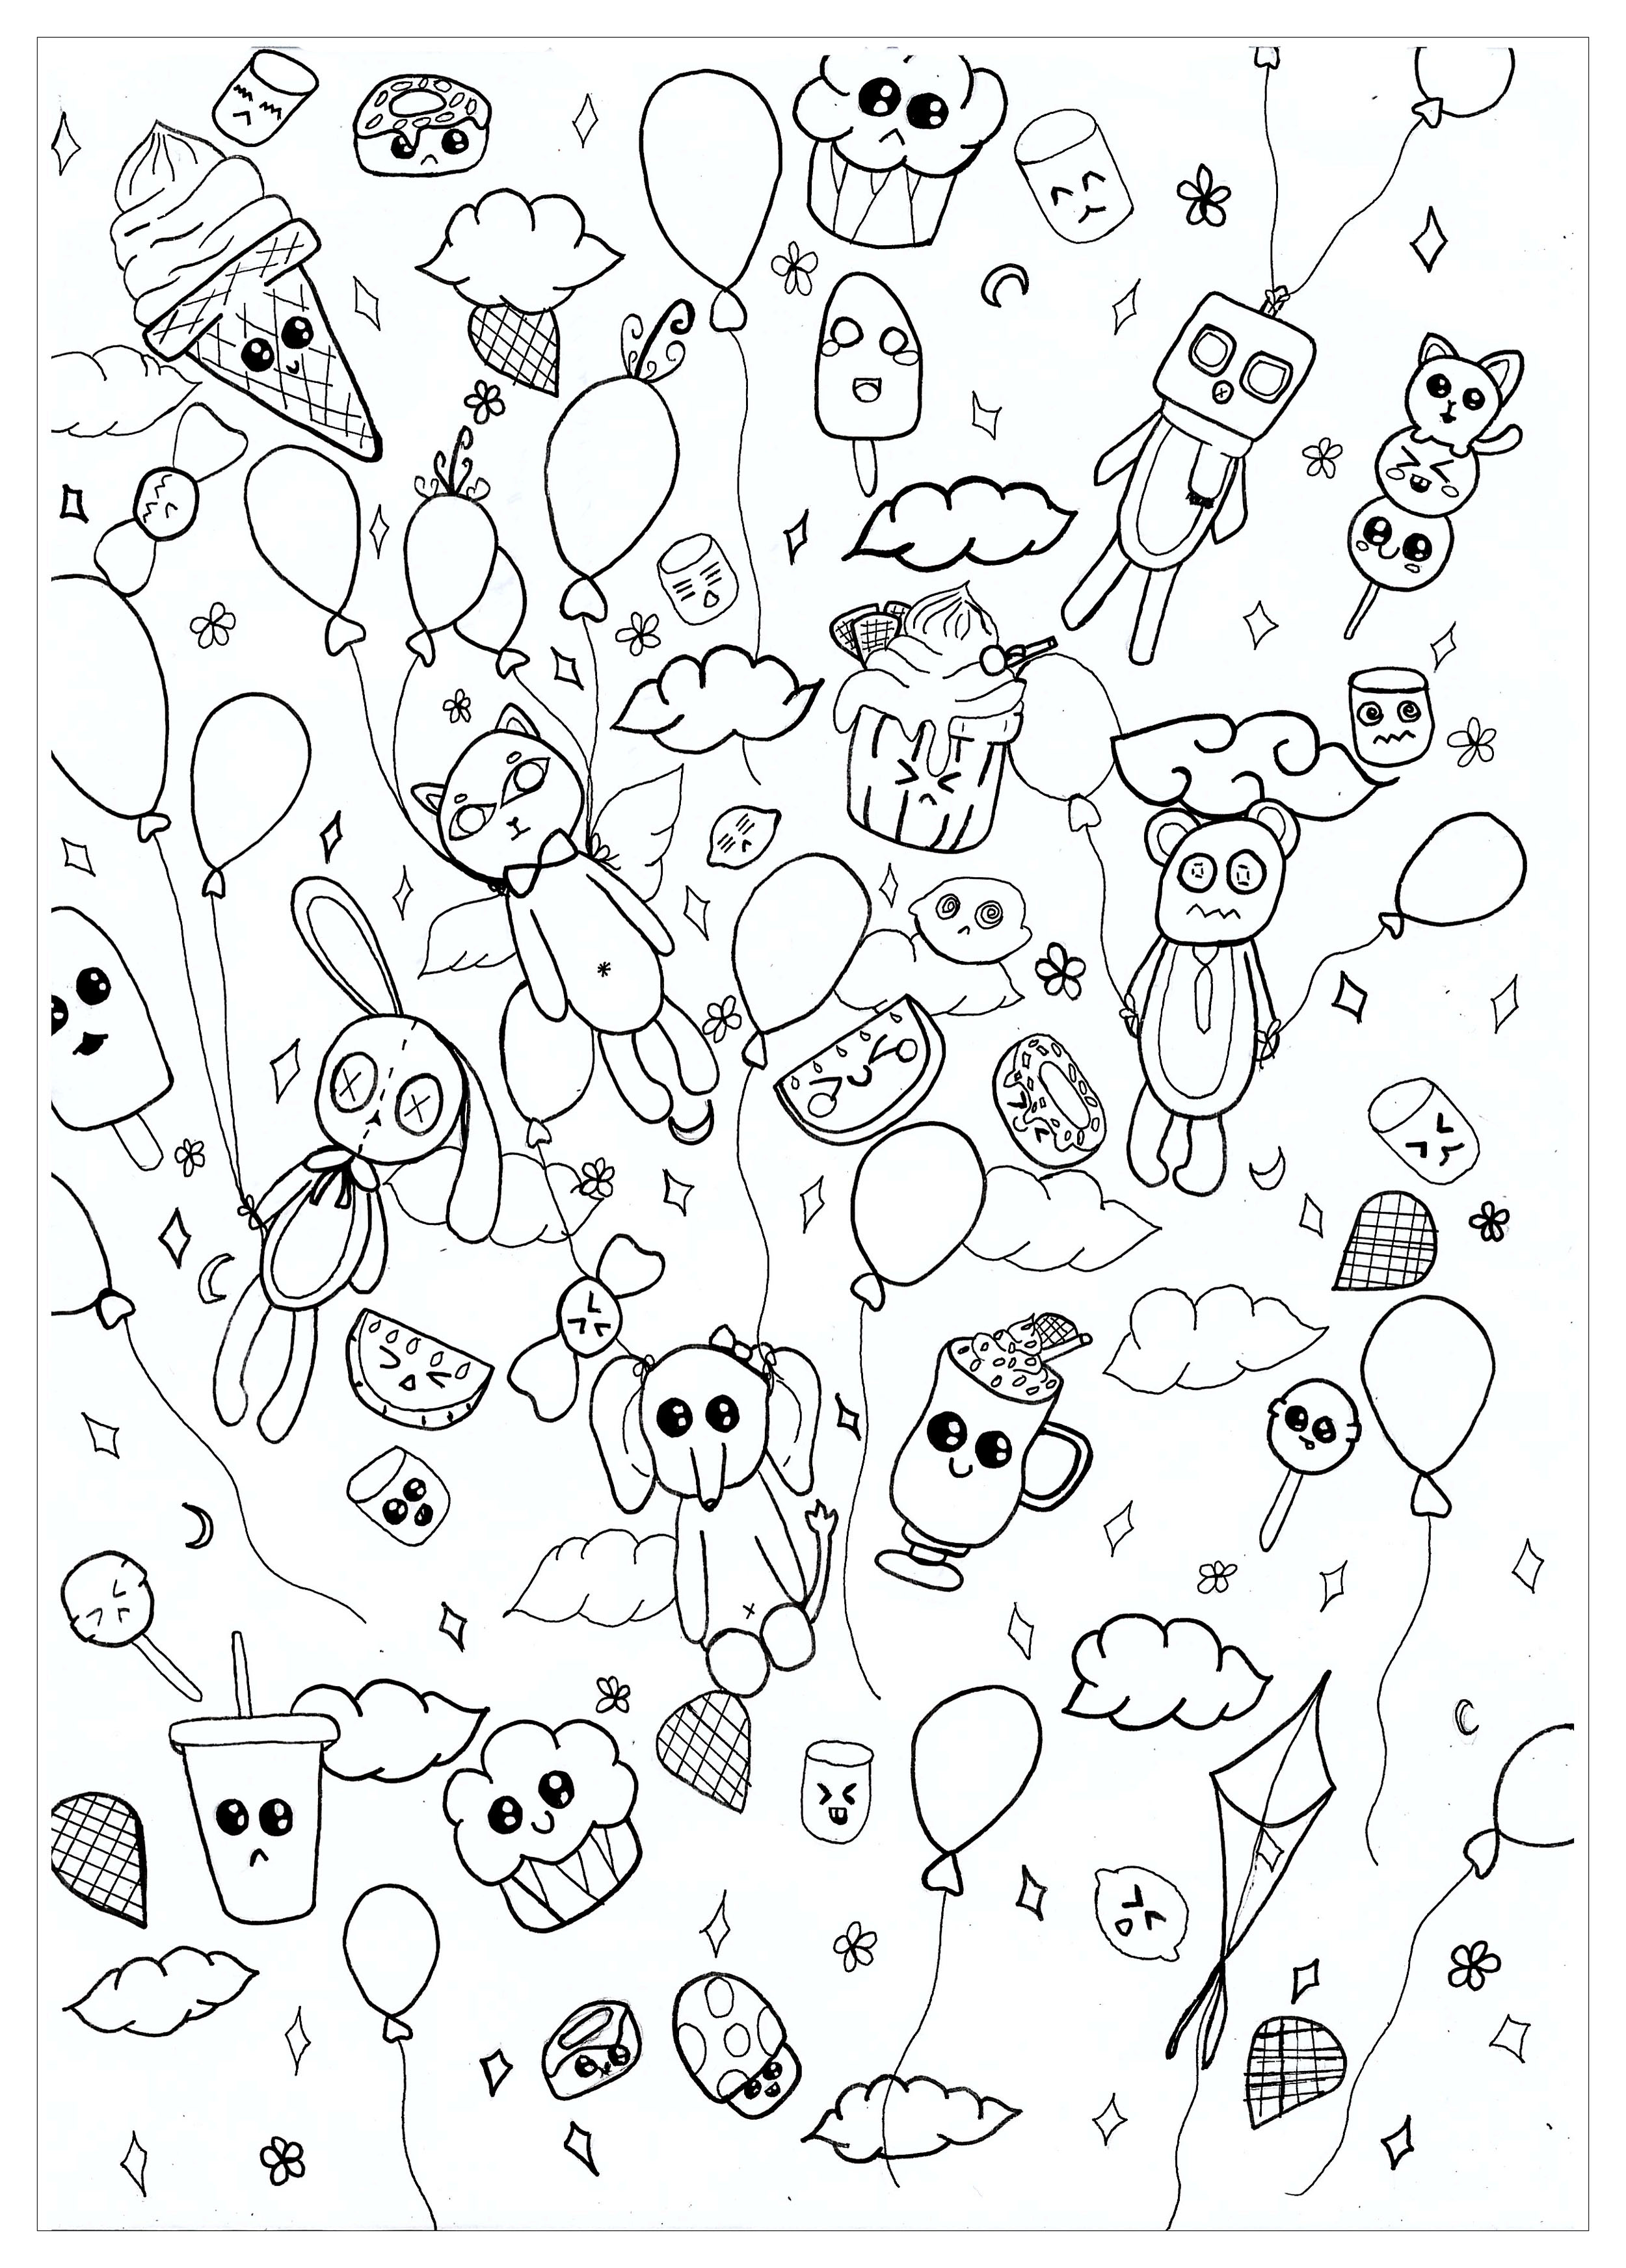 Doodle art free to color for kids - Doodle Art Kids Coloring ...